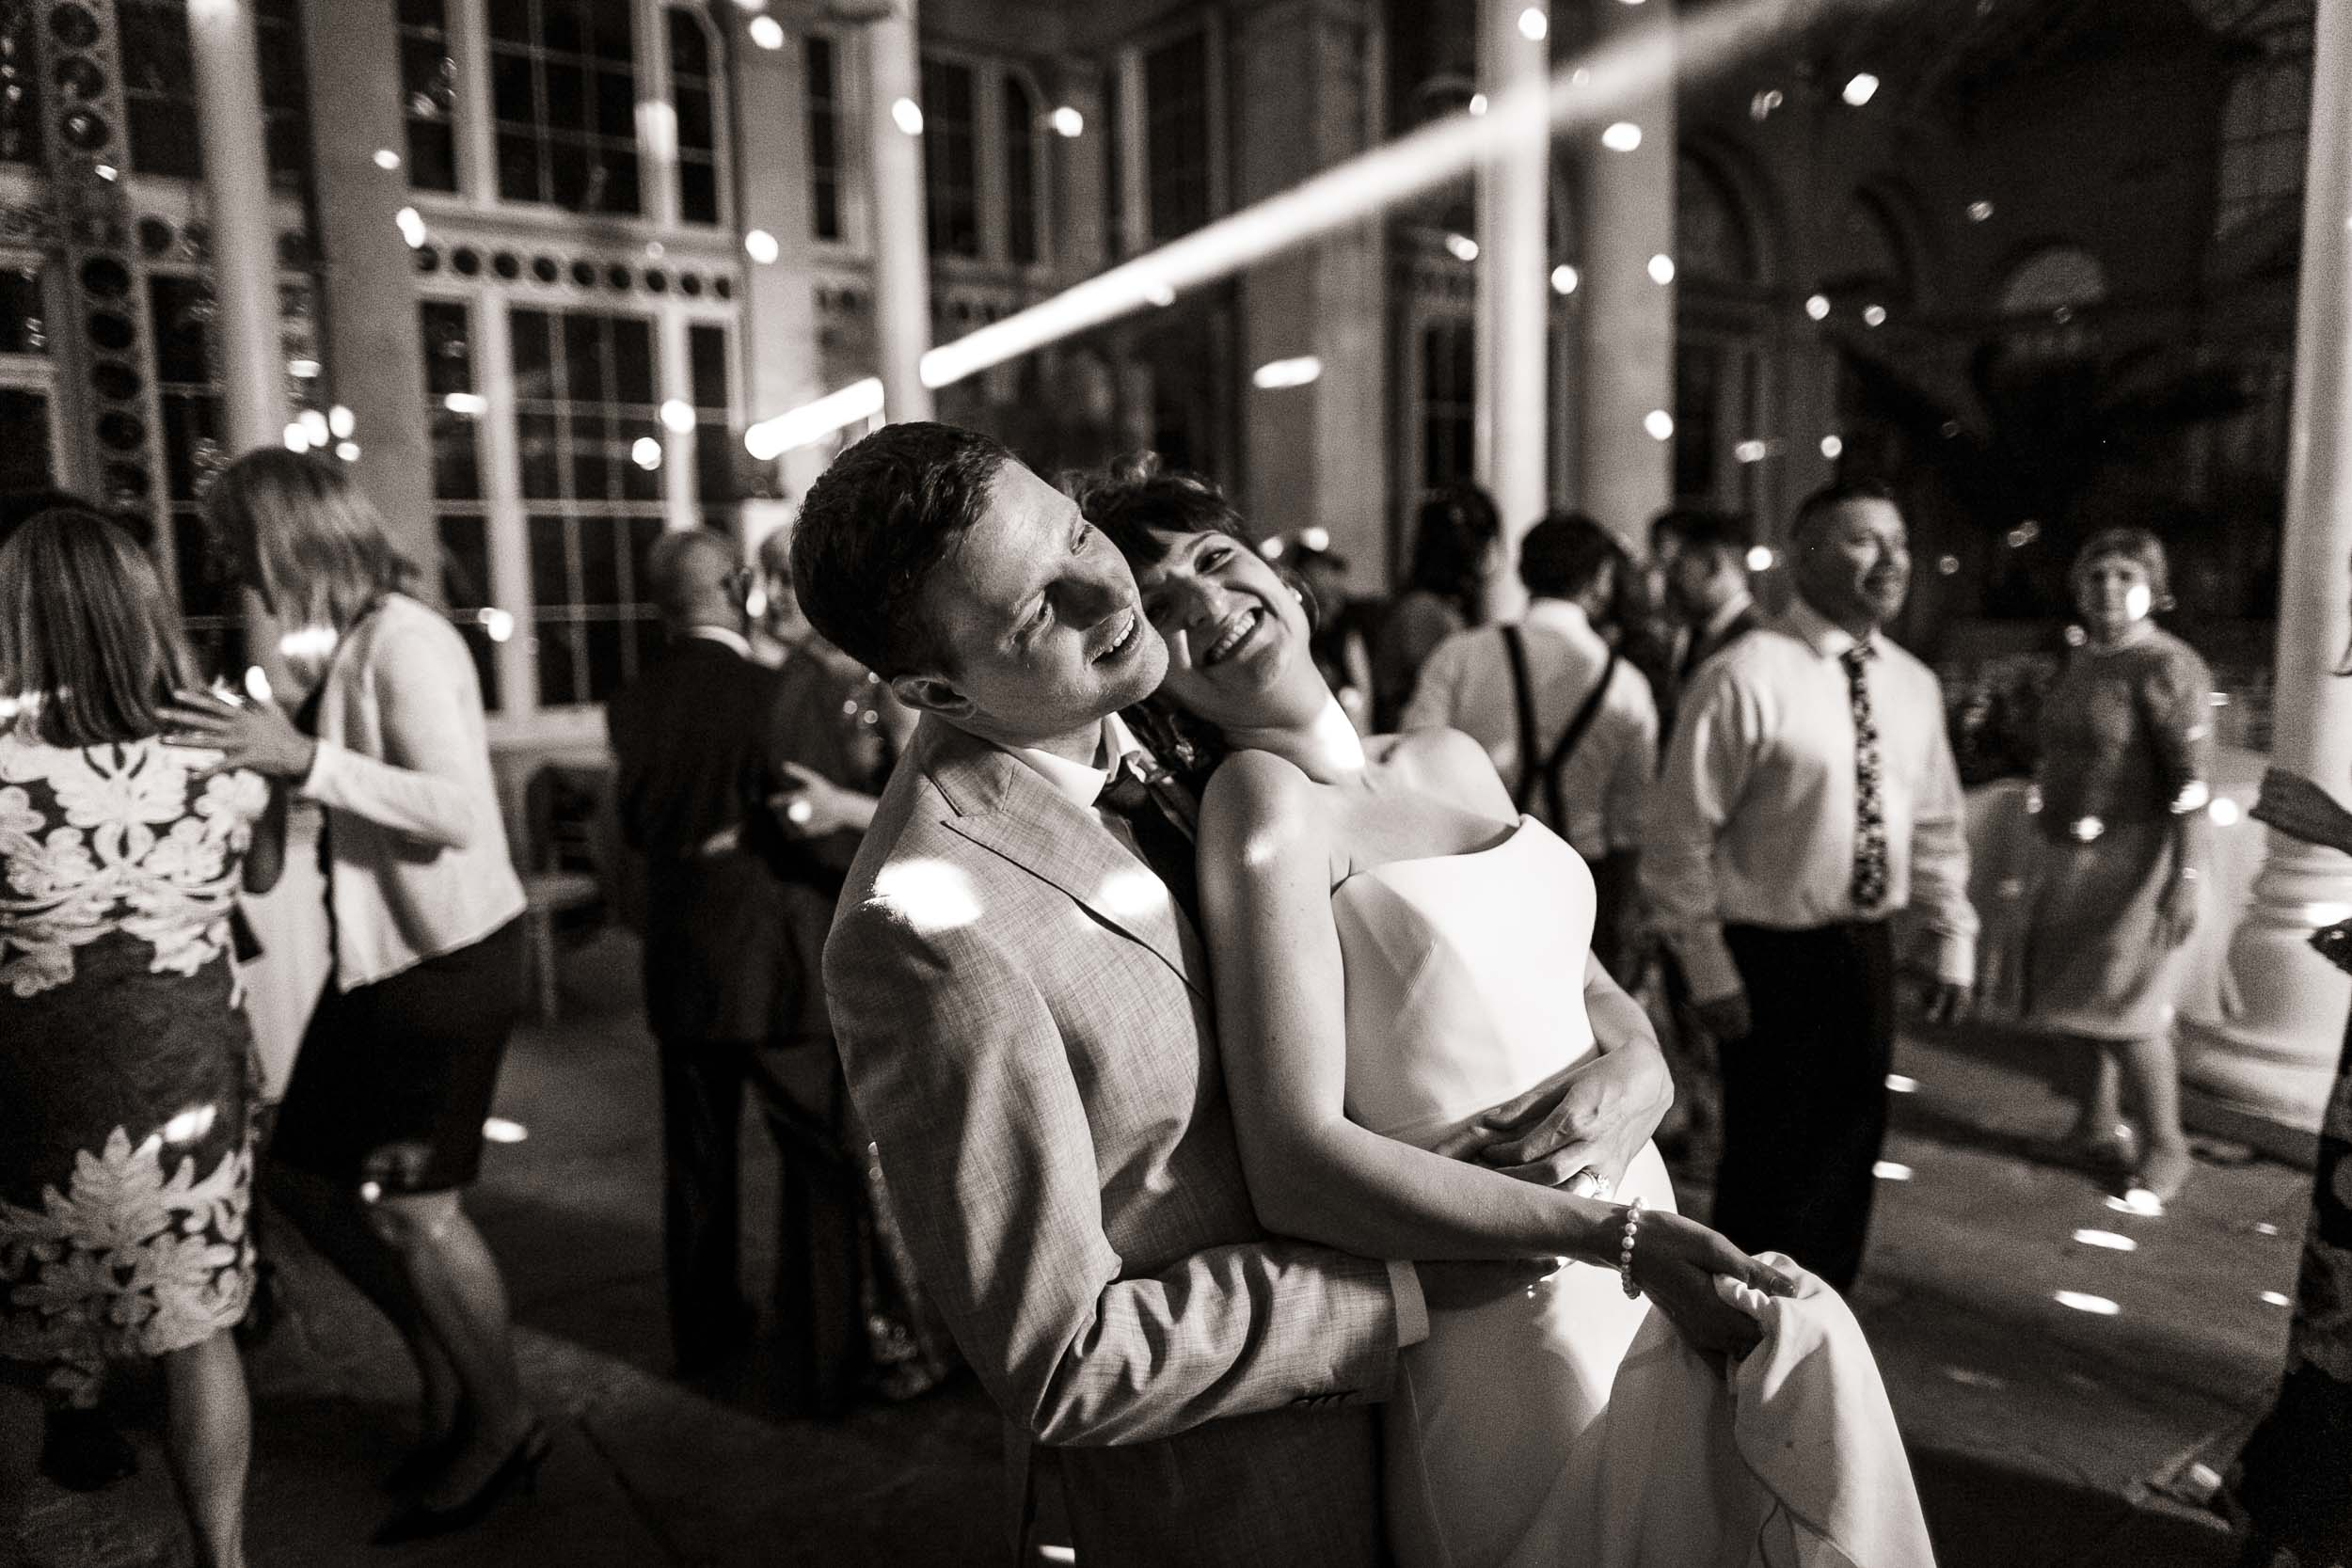 syon-house-wedding-photographer-london 163.jpg